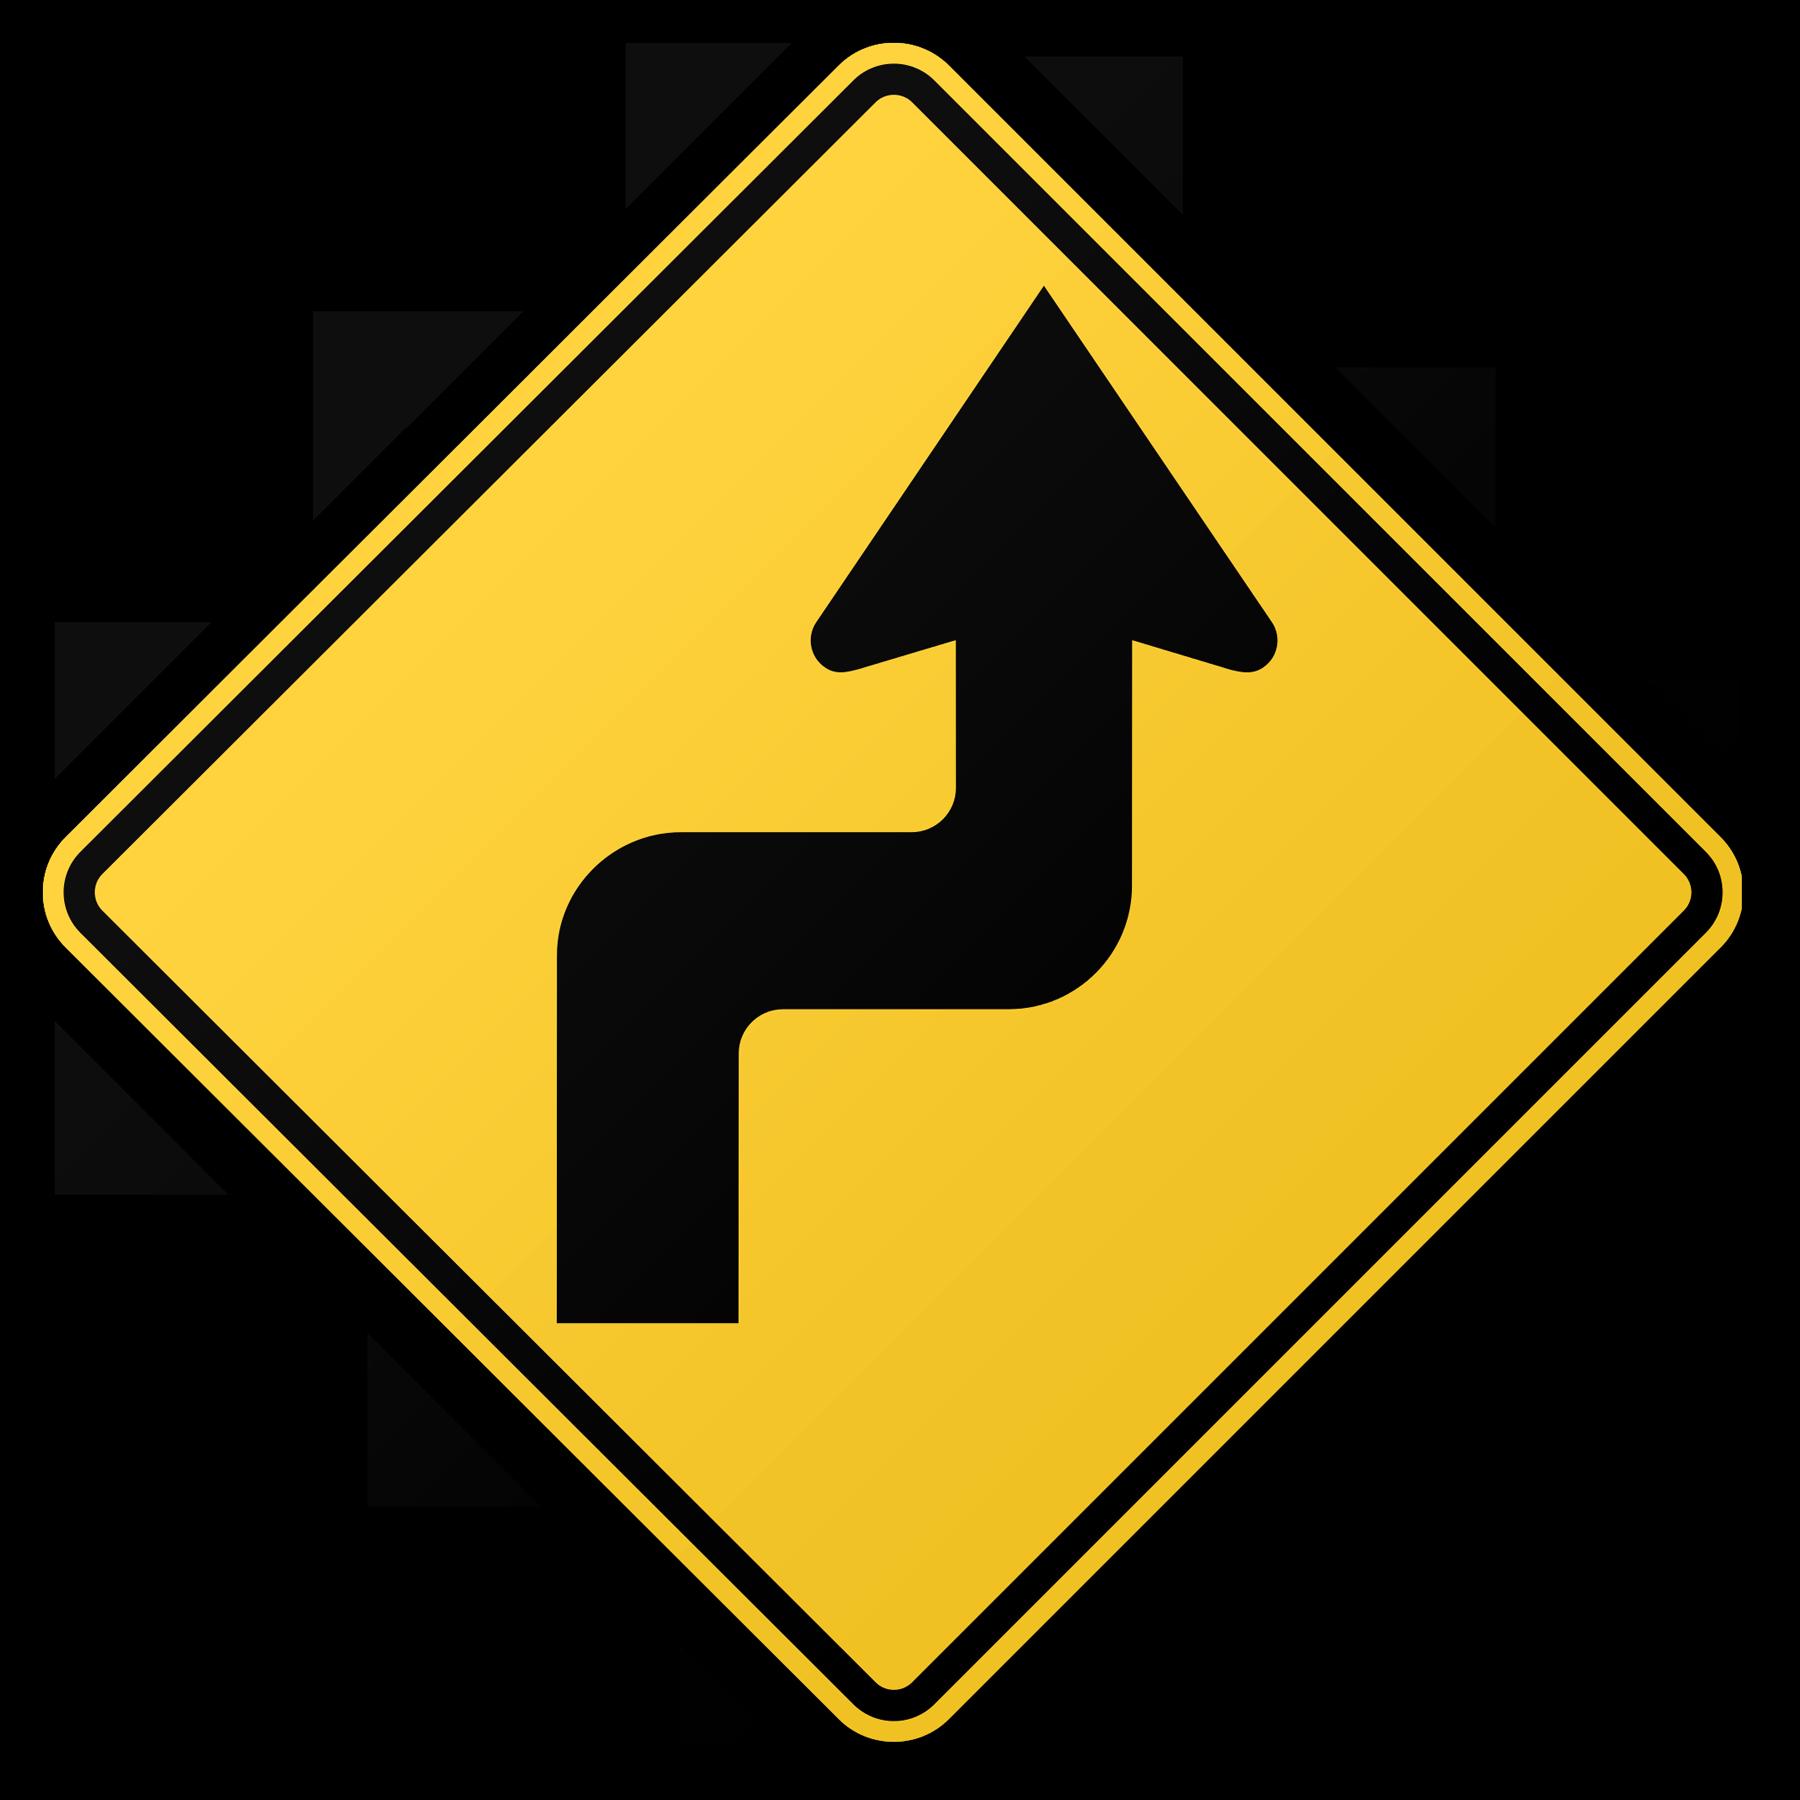 Zigzag png transparent images. Clipart road curving